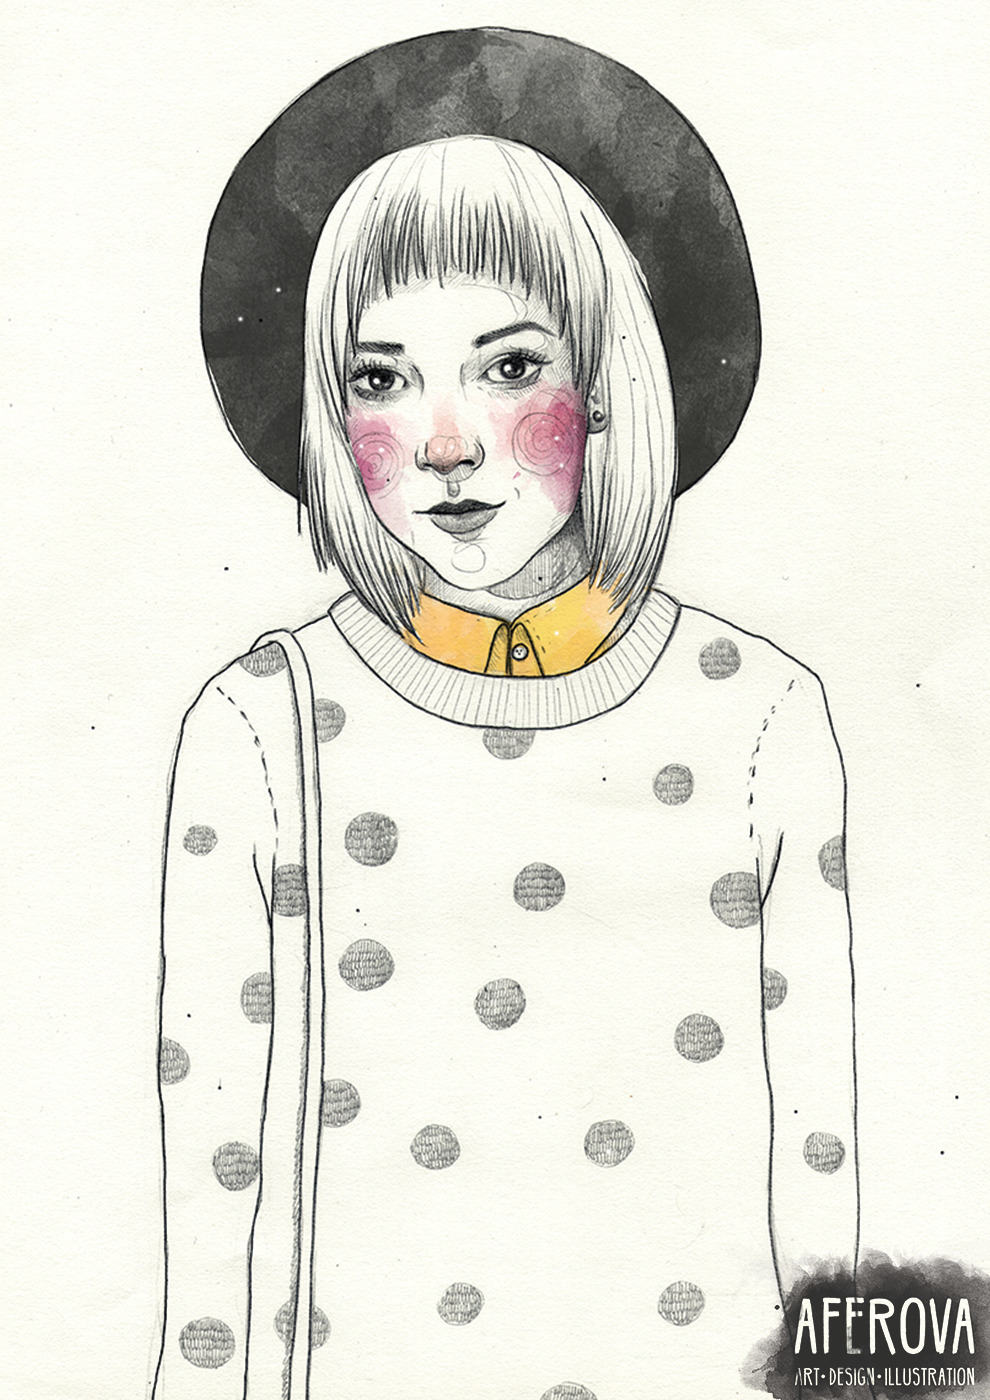 Julia - illustration, drawing, portrait - aferova | ello